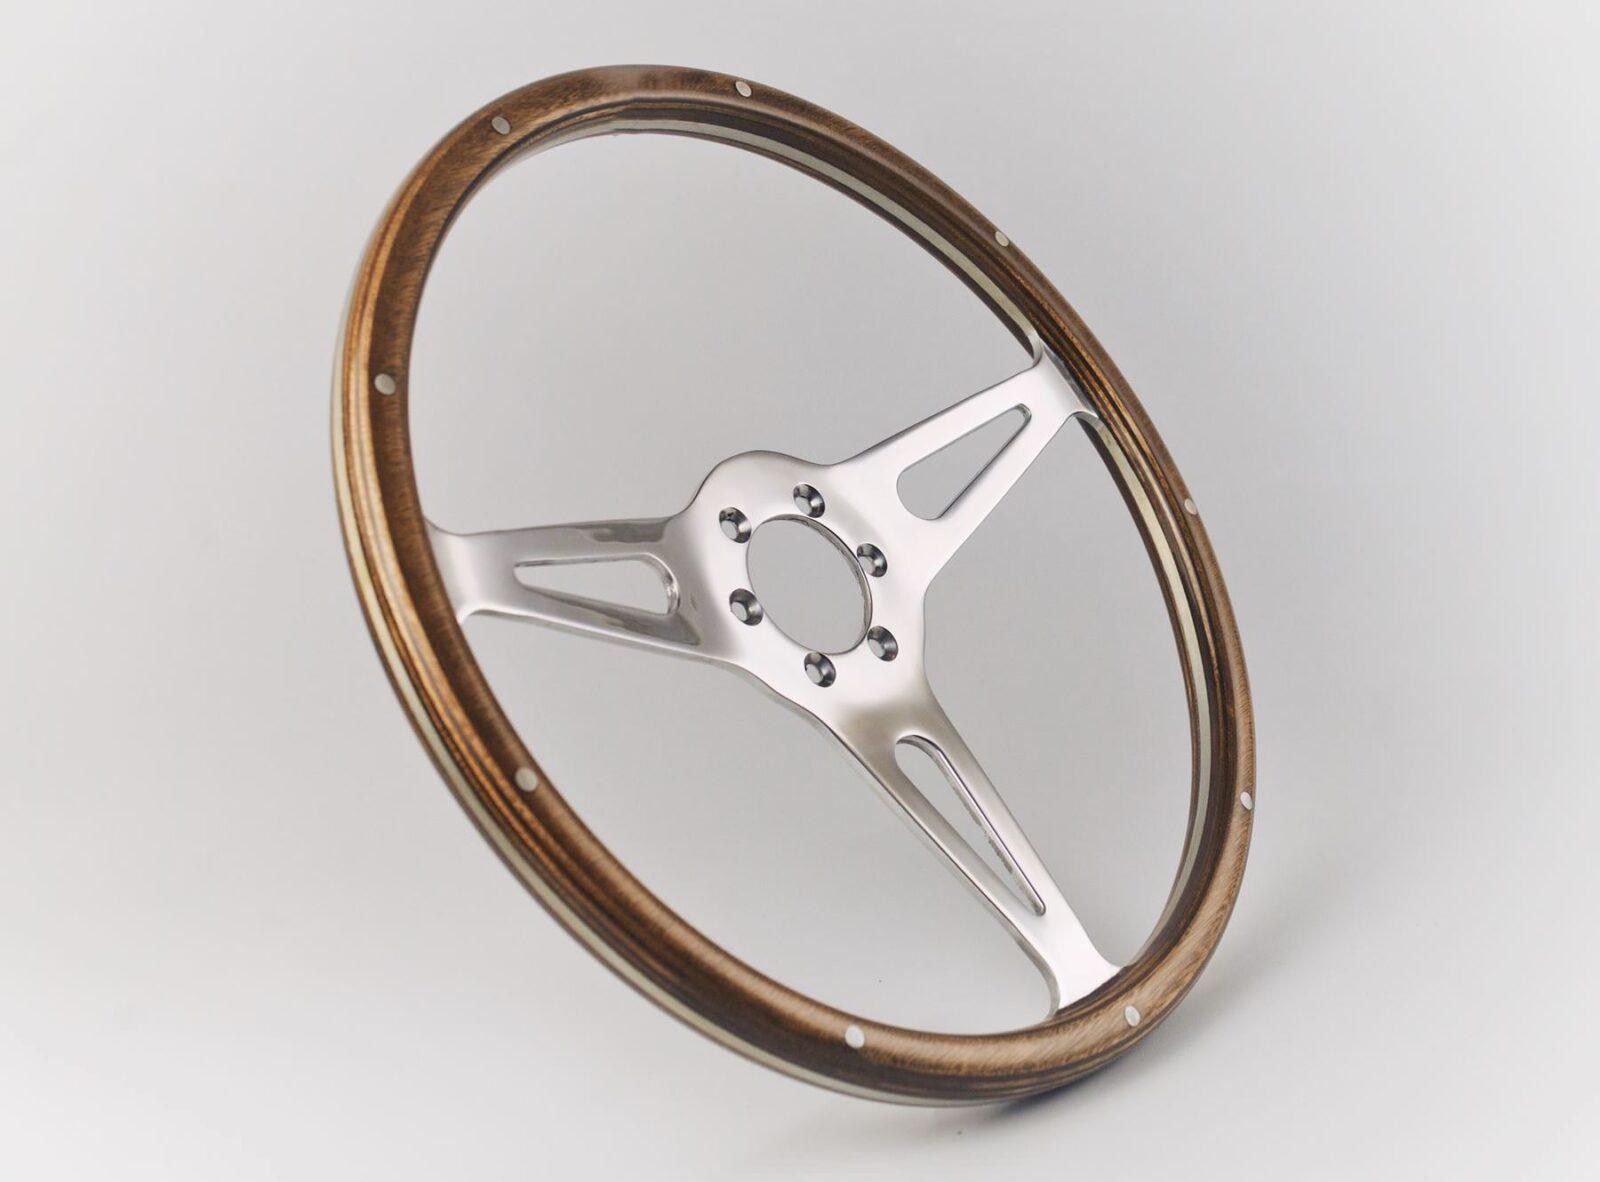 Moto-Lita AC Shelby Cobra Steering Wheel